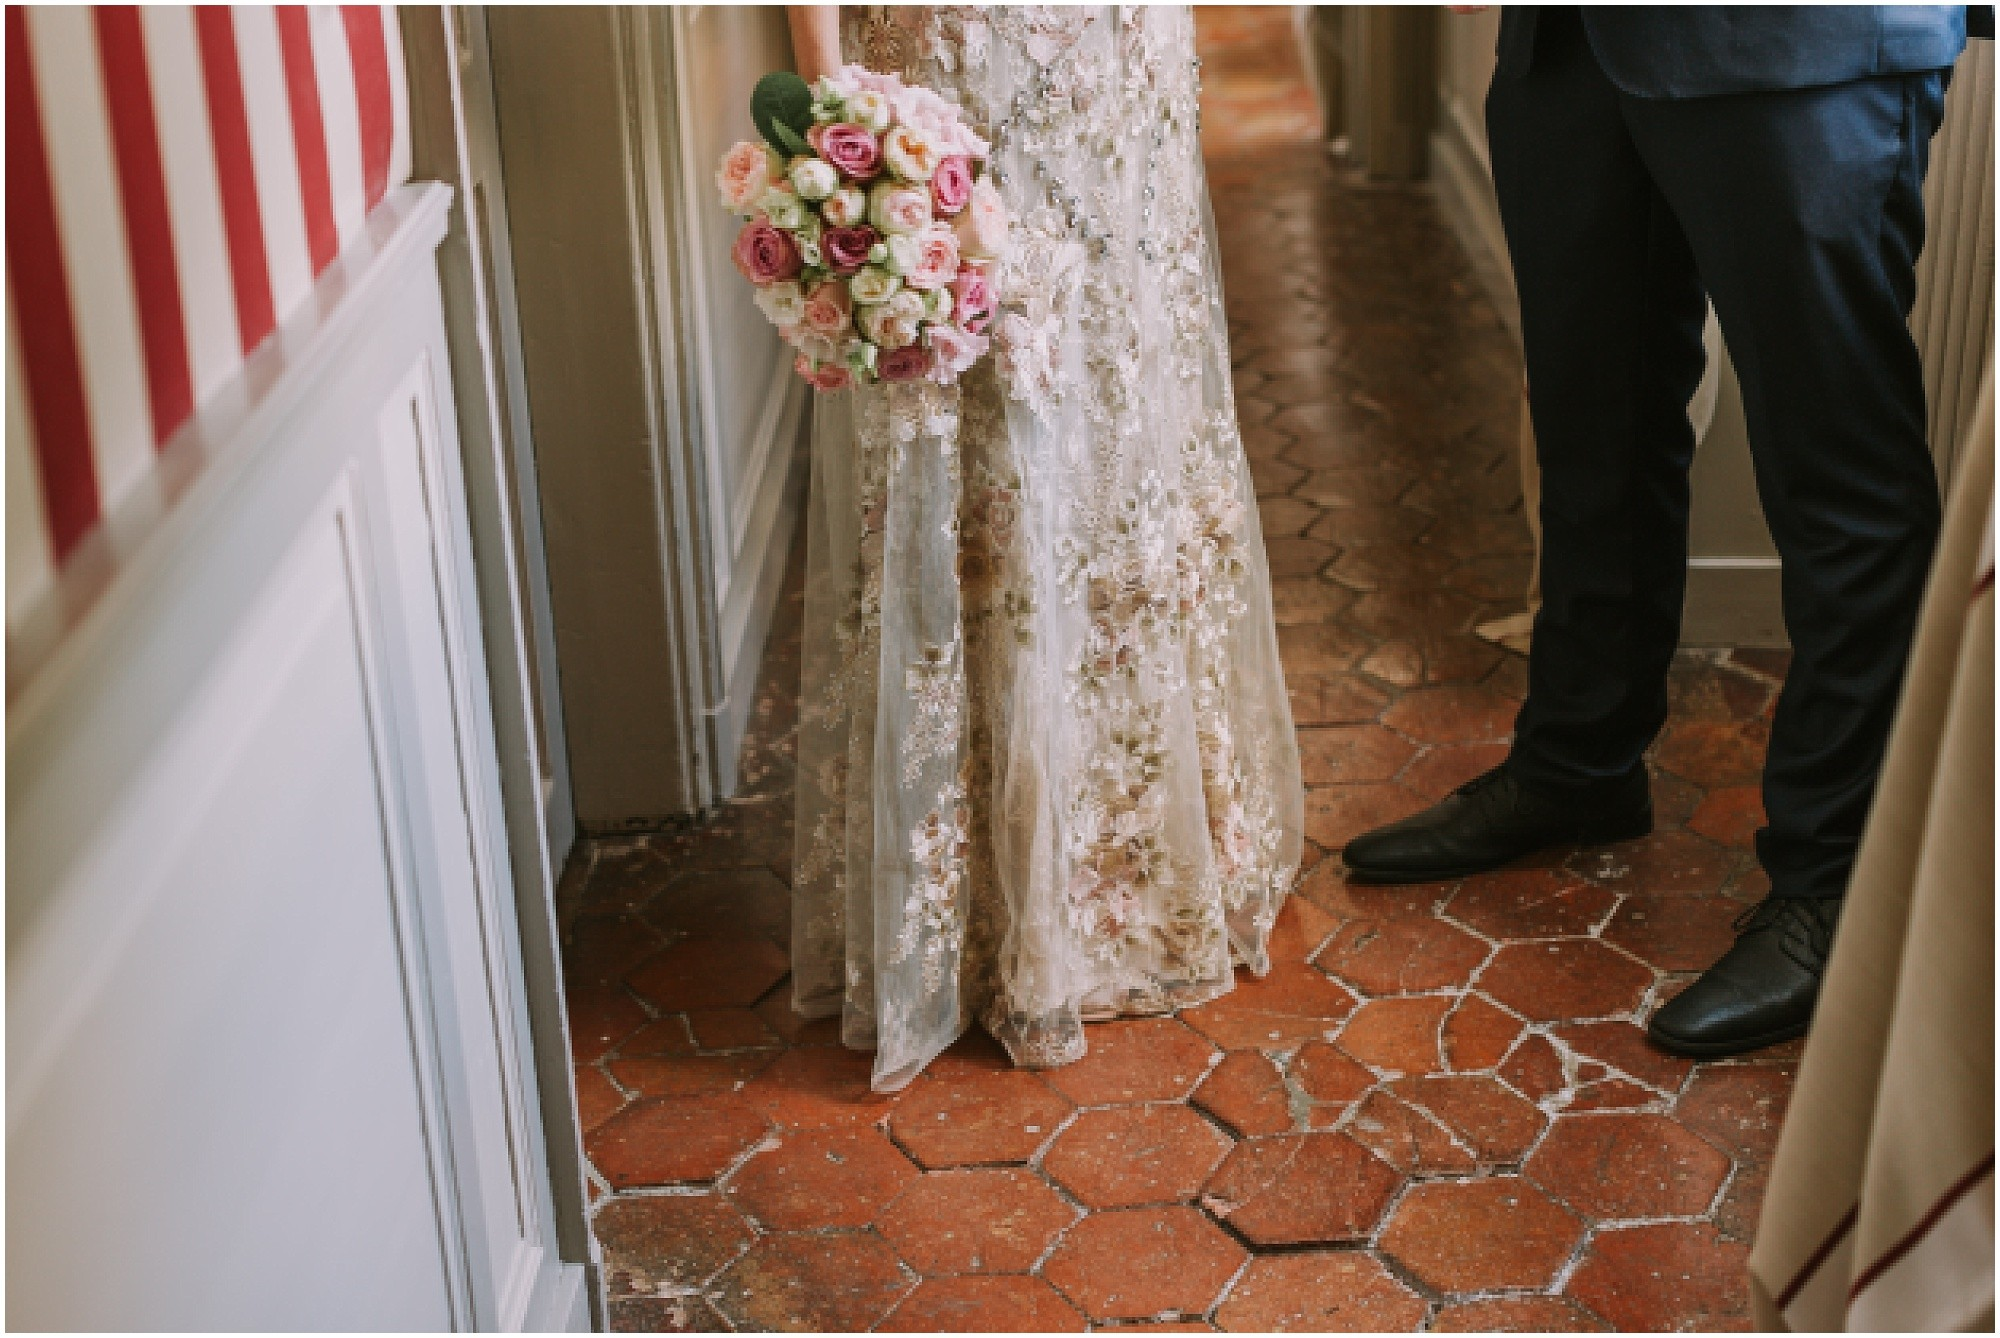 Kateryna-photos-photographer-mariage-chateau-saint-paterne-alencon-normandie-mayenne-le-mans_0021.jpg